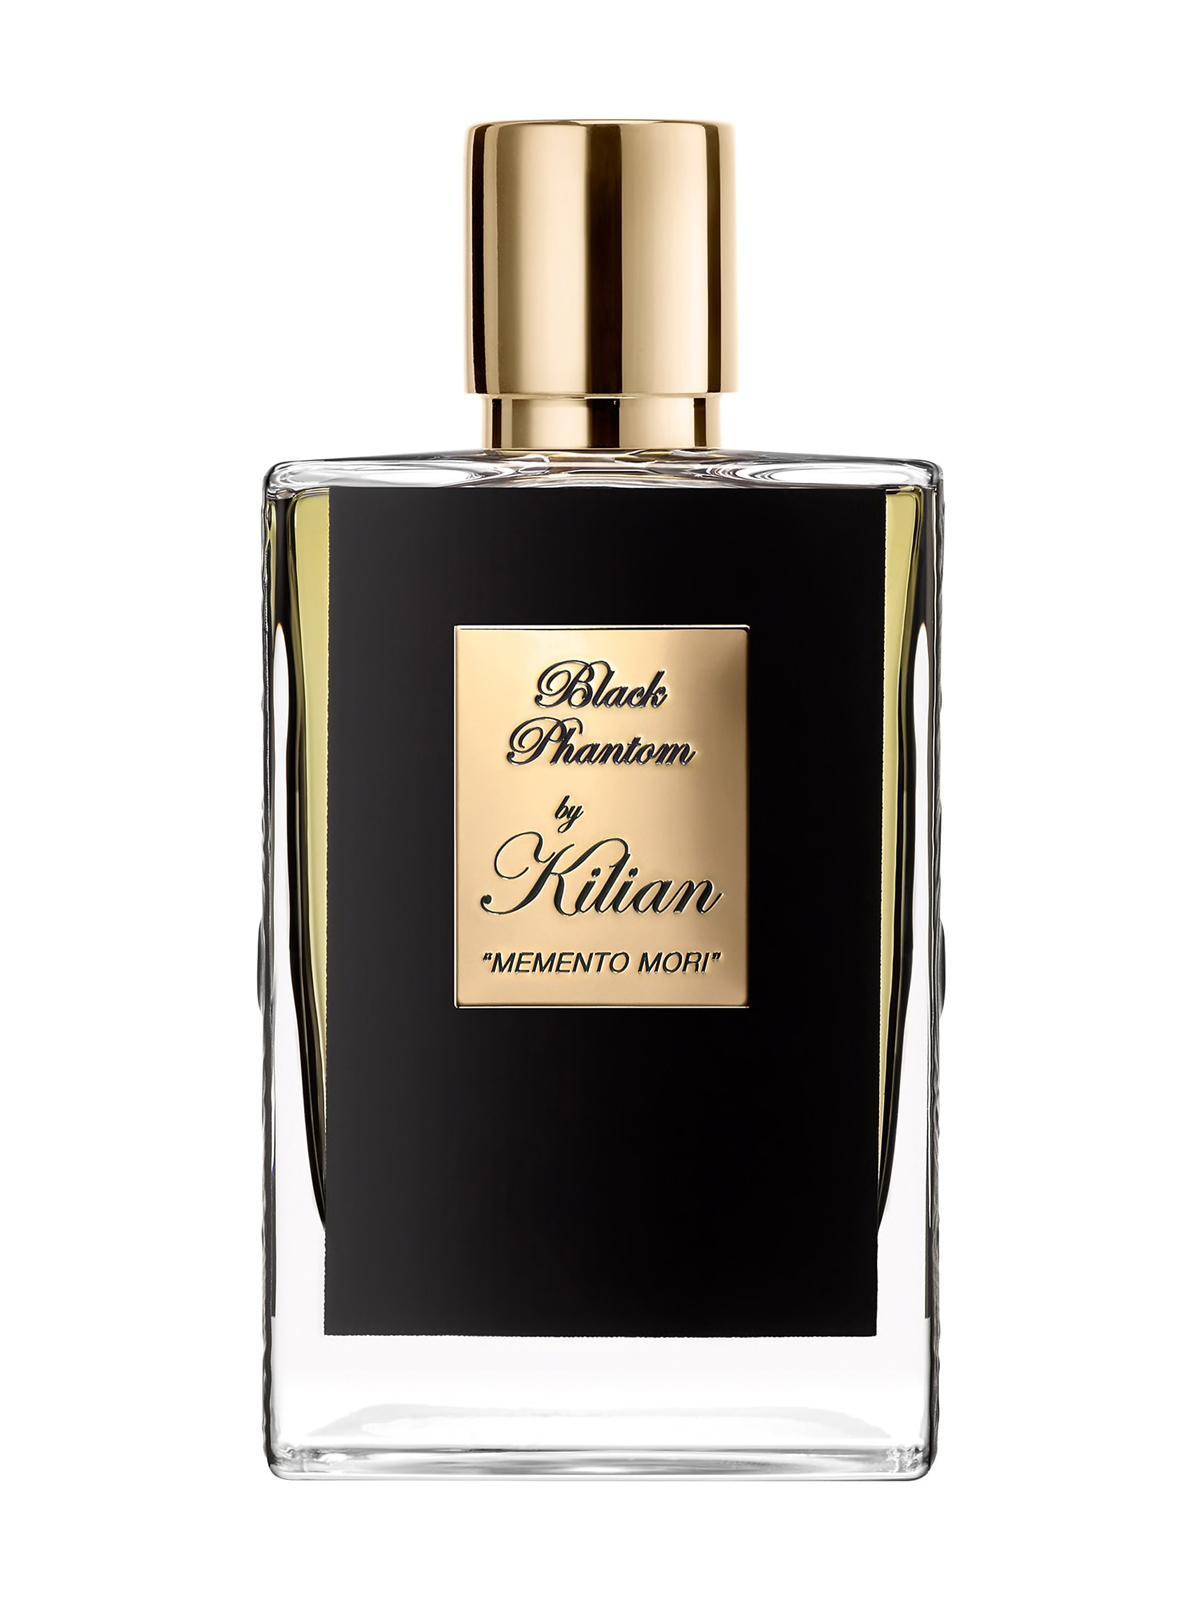 Kilian Memento Mori By Black Phantom for Unisex Eau De Parfum 50ML